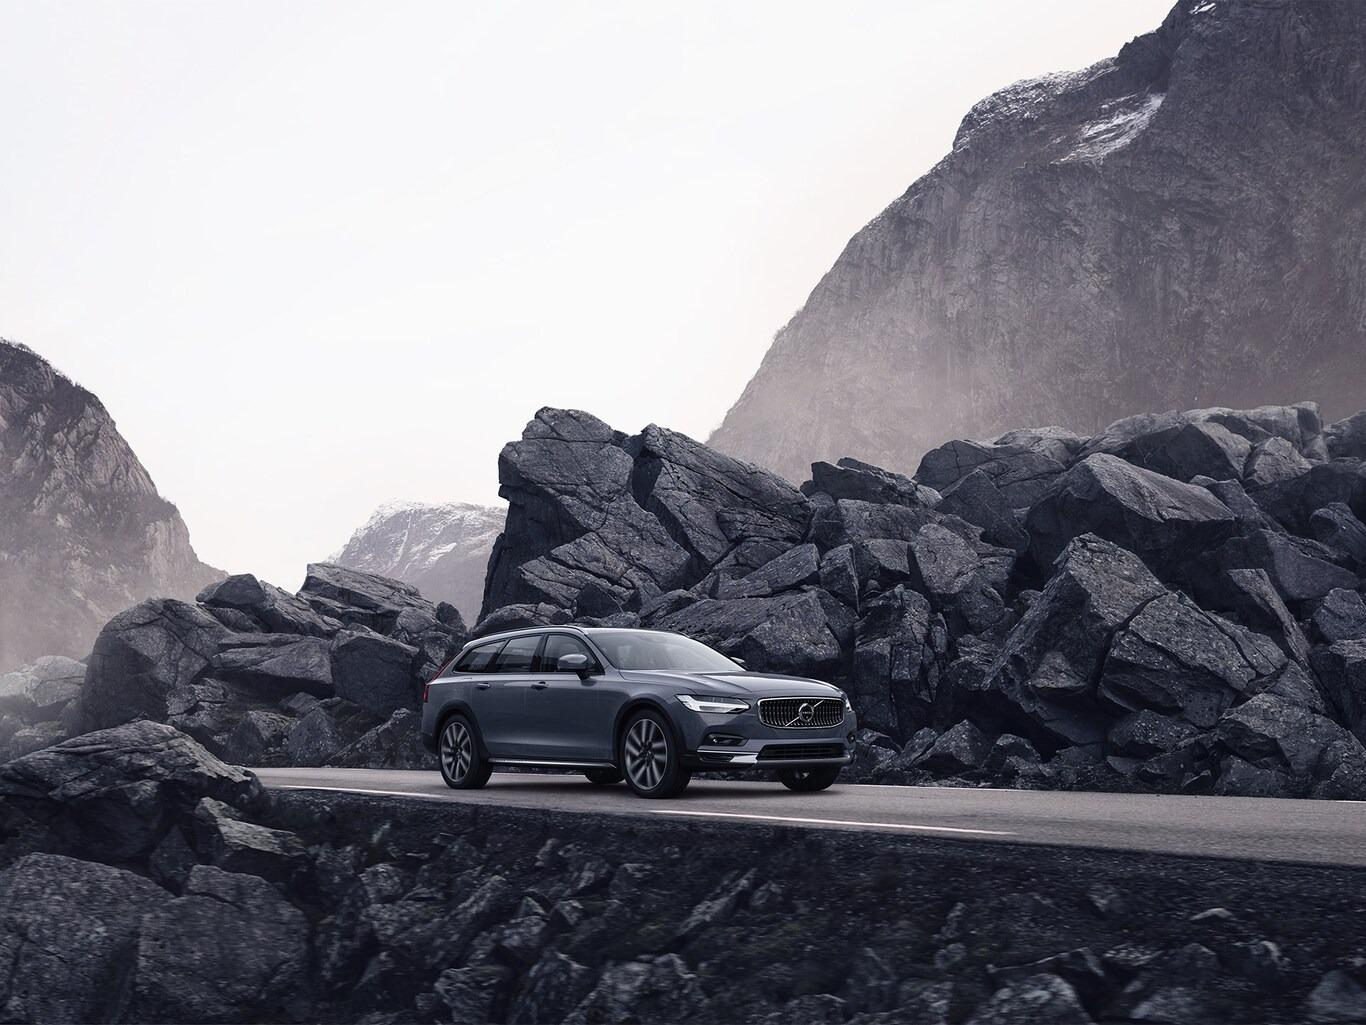 ��������������� ������ ������ ������ ������ ������ ��������� Volvo